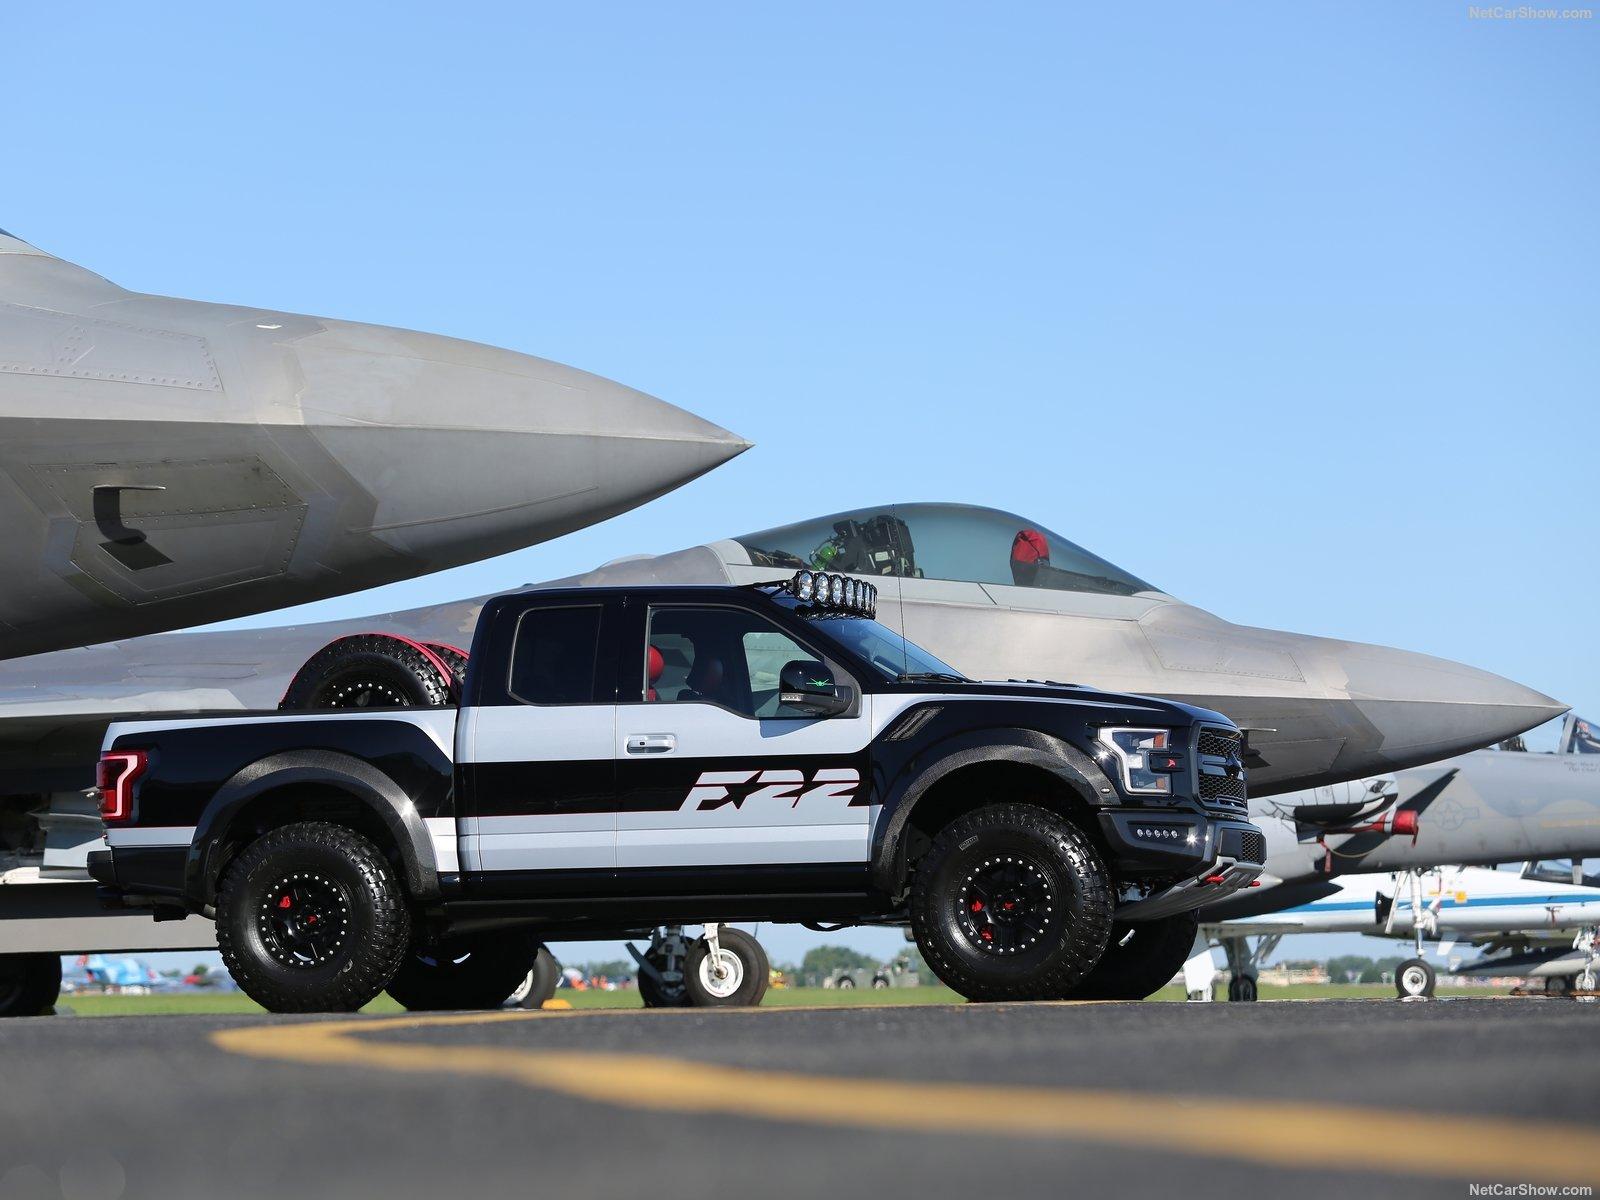 Ford-F-150_Raptor_F-22_Concept-2017-1600-07